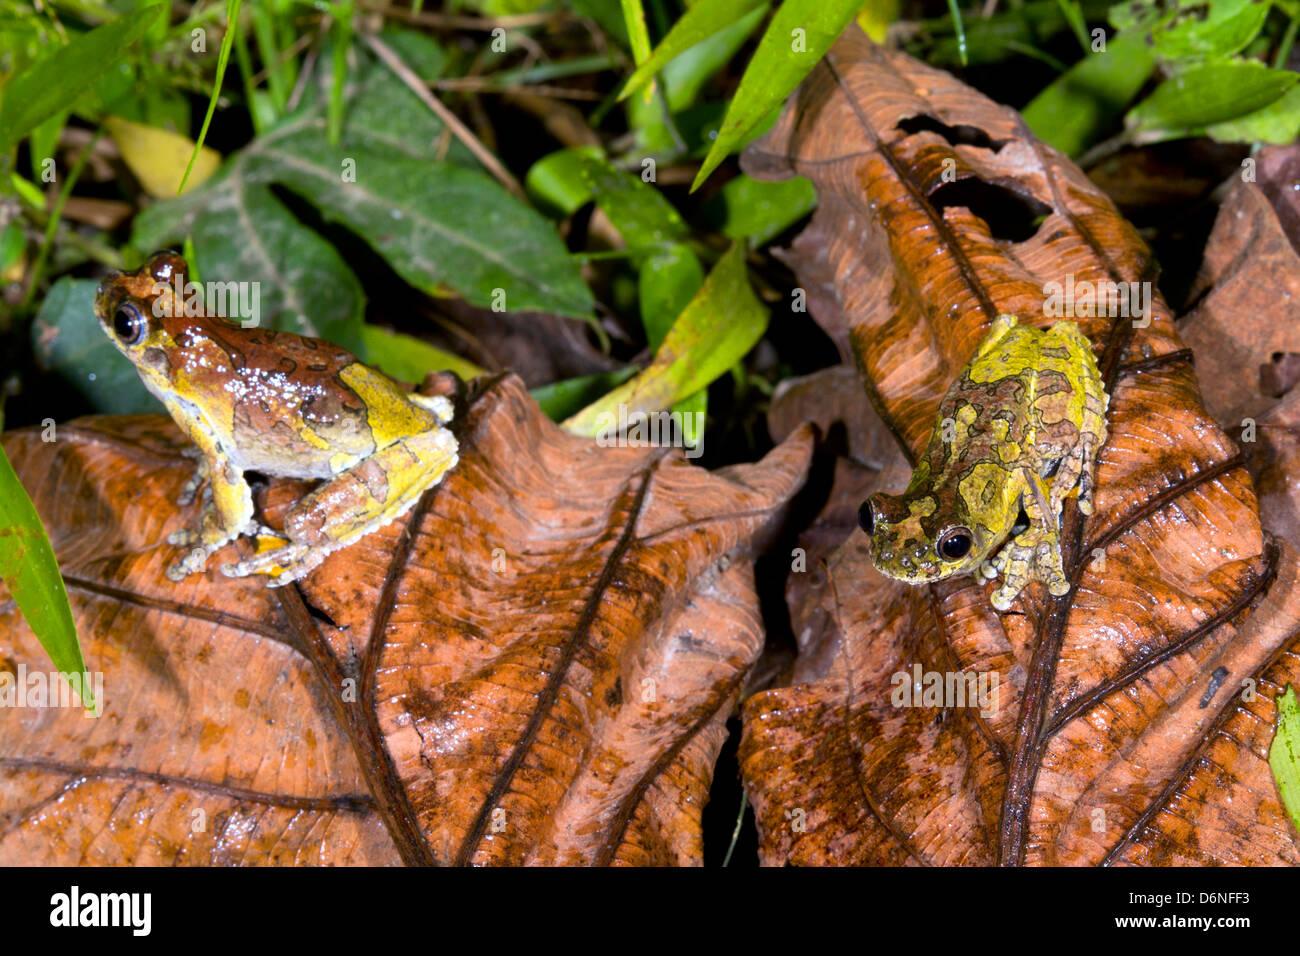 Two Neotropical marbled treefrogs (Dendropsophus marmoratus) on the rainforest floor, Ecuador - Stock Image